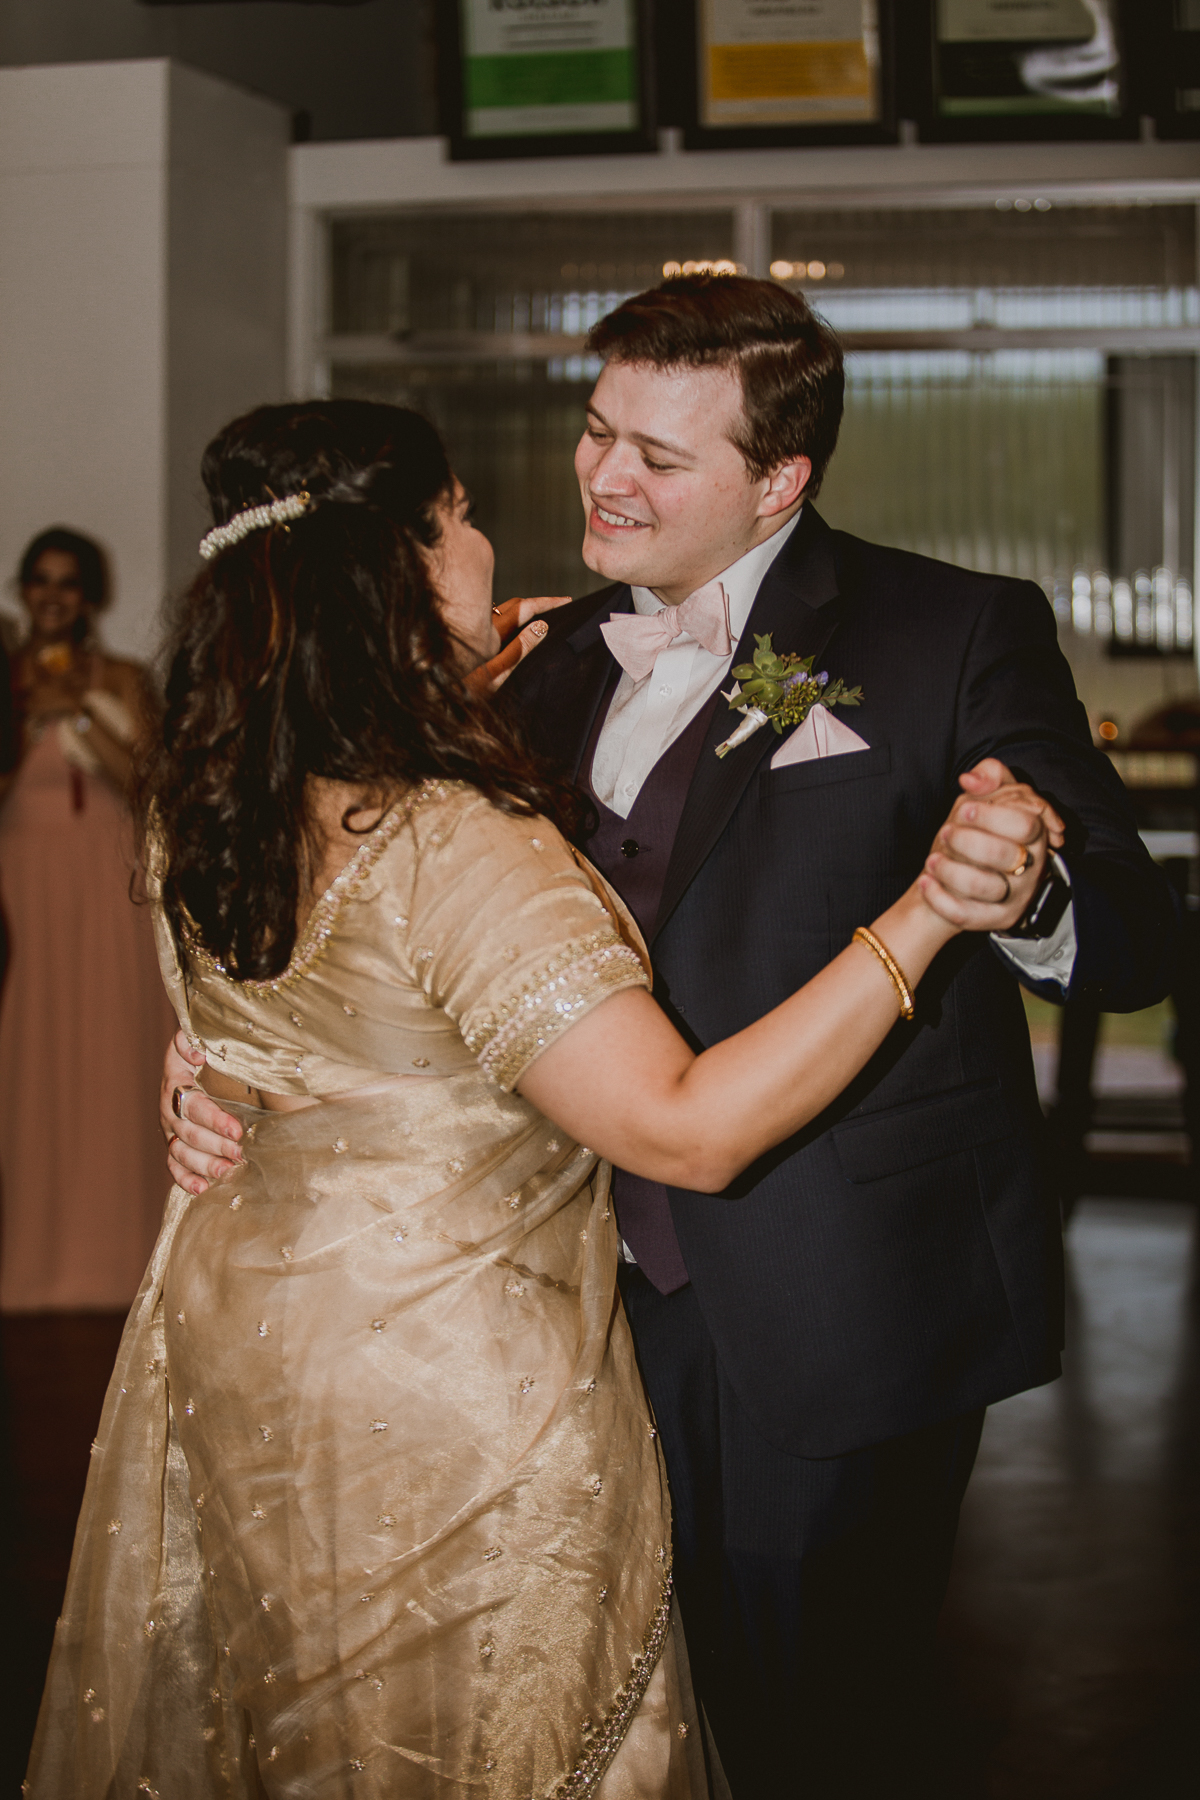 eventide-brewery-indian-american-fusion-kelley-raye-atlanta-los-angeles-wedding-photographer-107.jpg